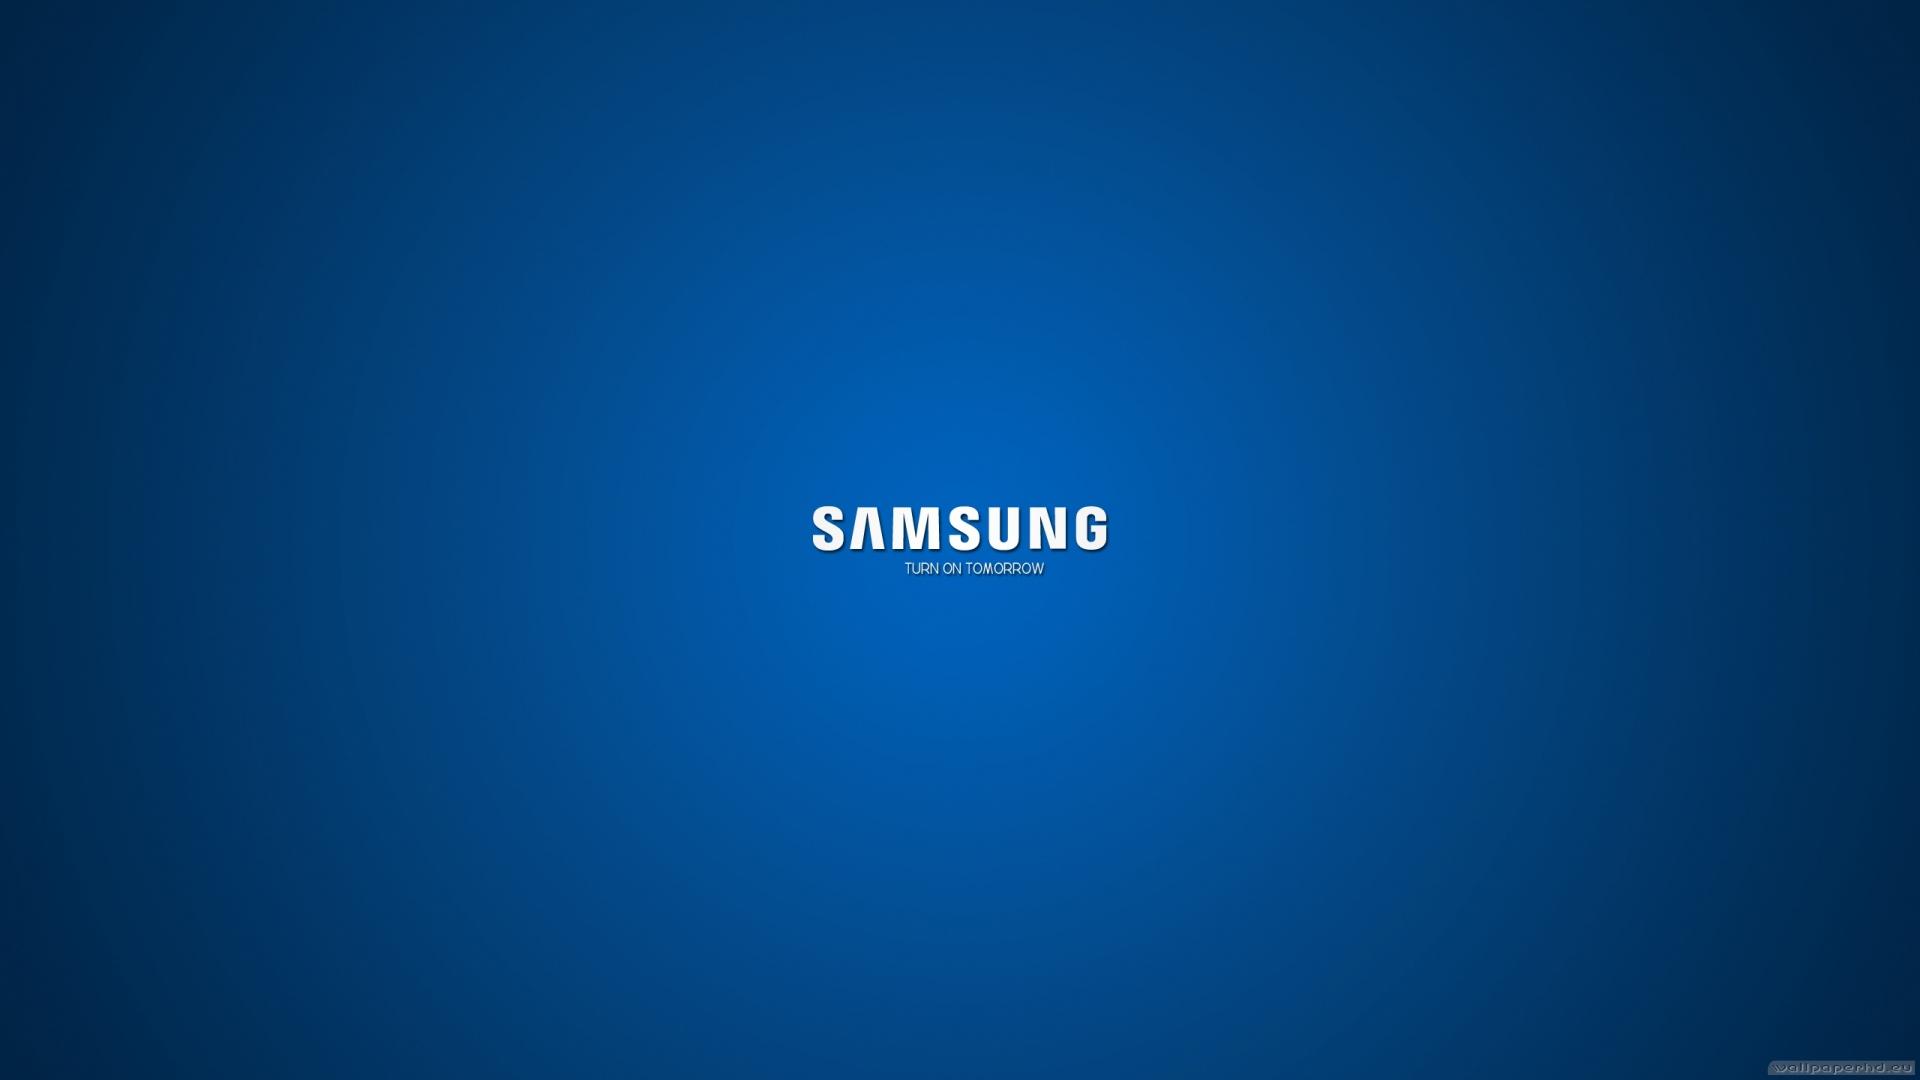 Samsung Galaxy Note 2 Wallpaper Hd Beautiful beach hd wallpapers 1920x1080